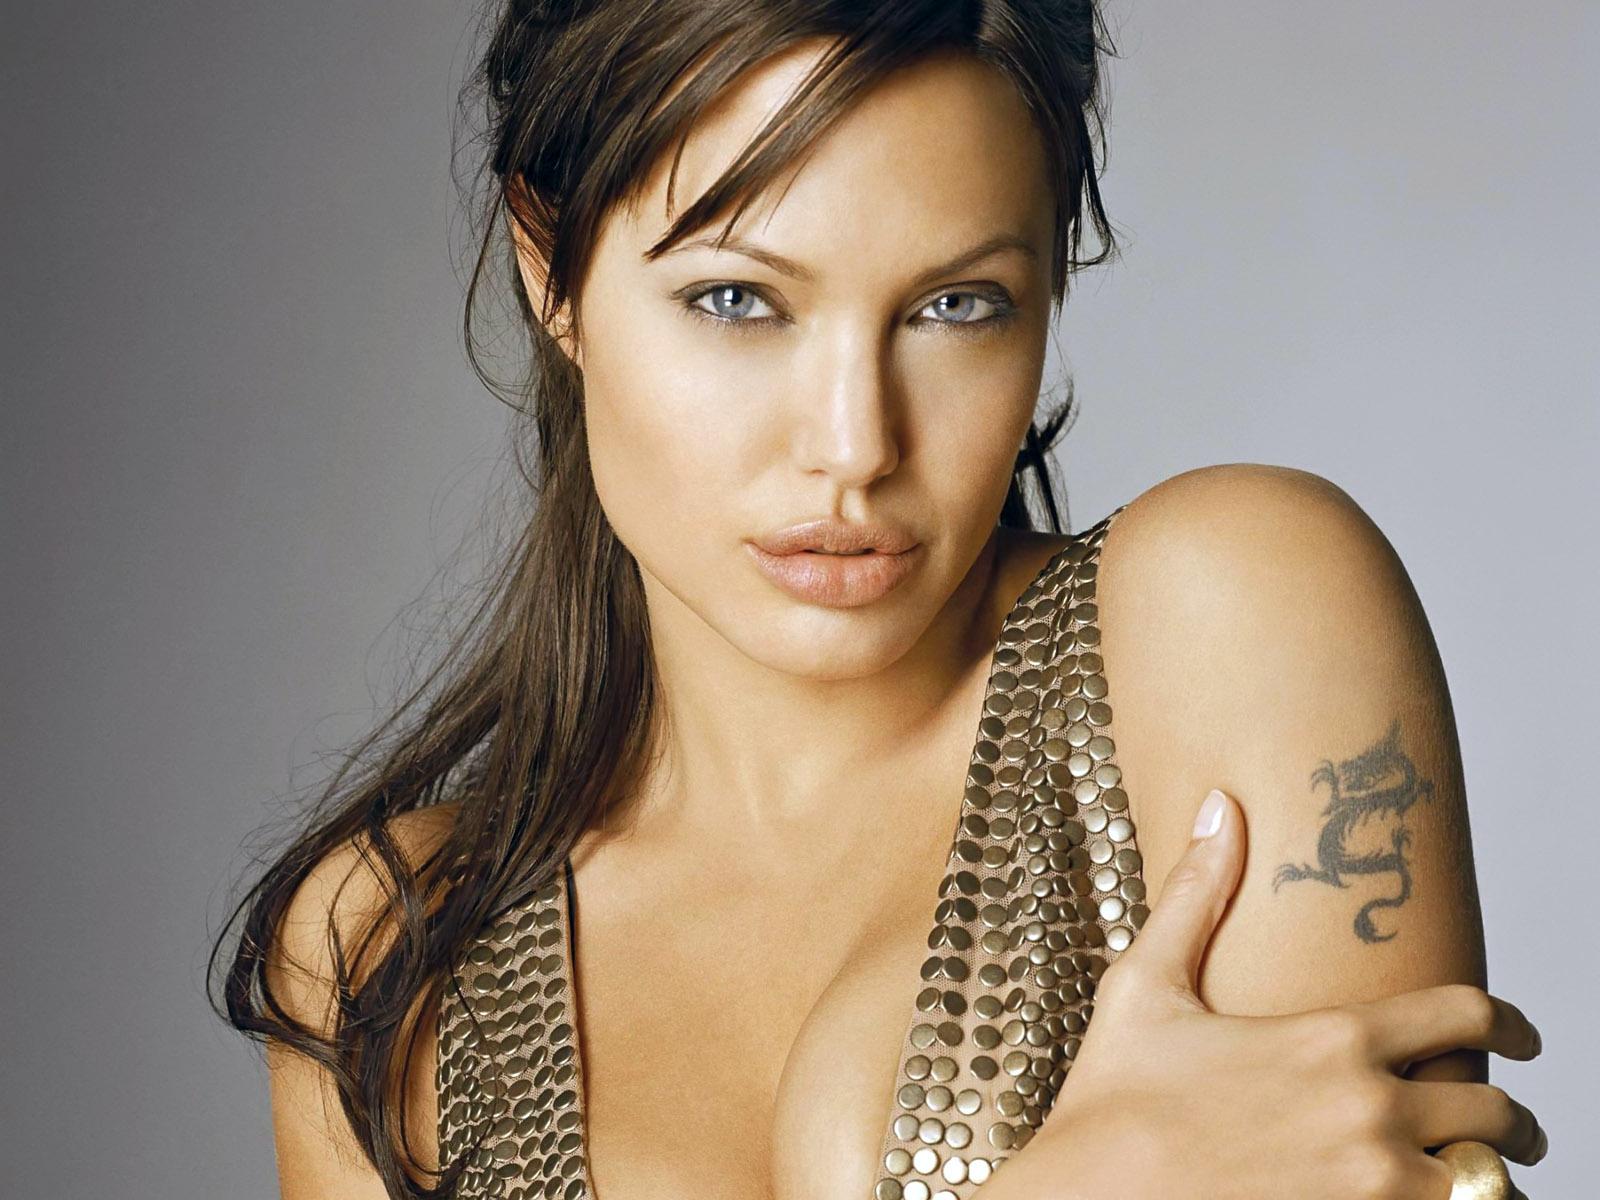 http://2.bp.blogspot.com/-aw_cbd54mzI/Tu-TyulOX1I/AAAAAAAAAHw/HNsricleJ50/s1600/somosout.blogspot.com-the-girl-with-the-dragon-tattoo-movie.jpg